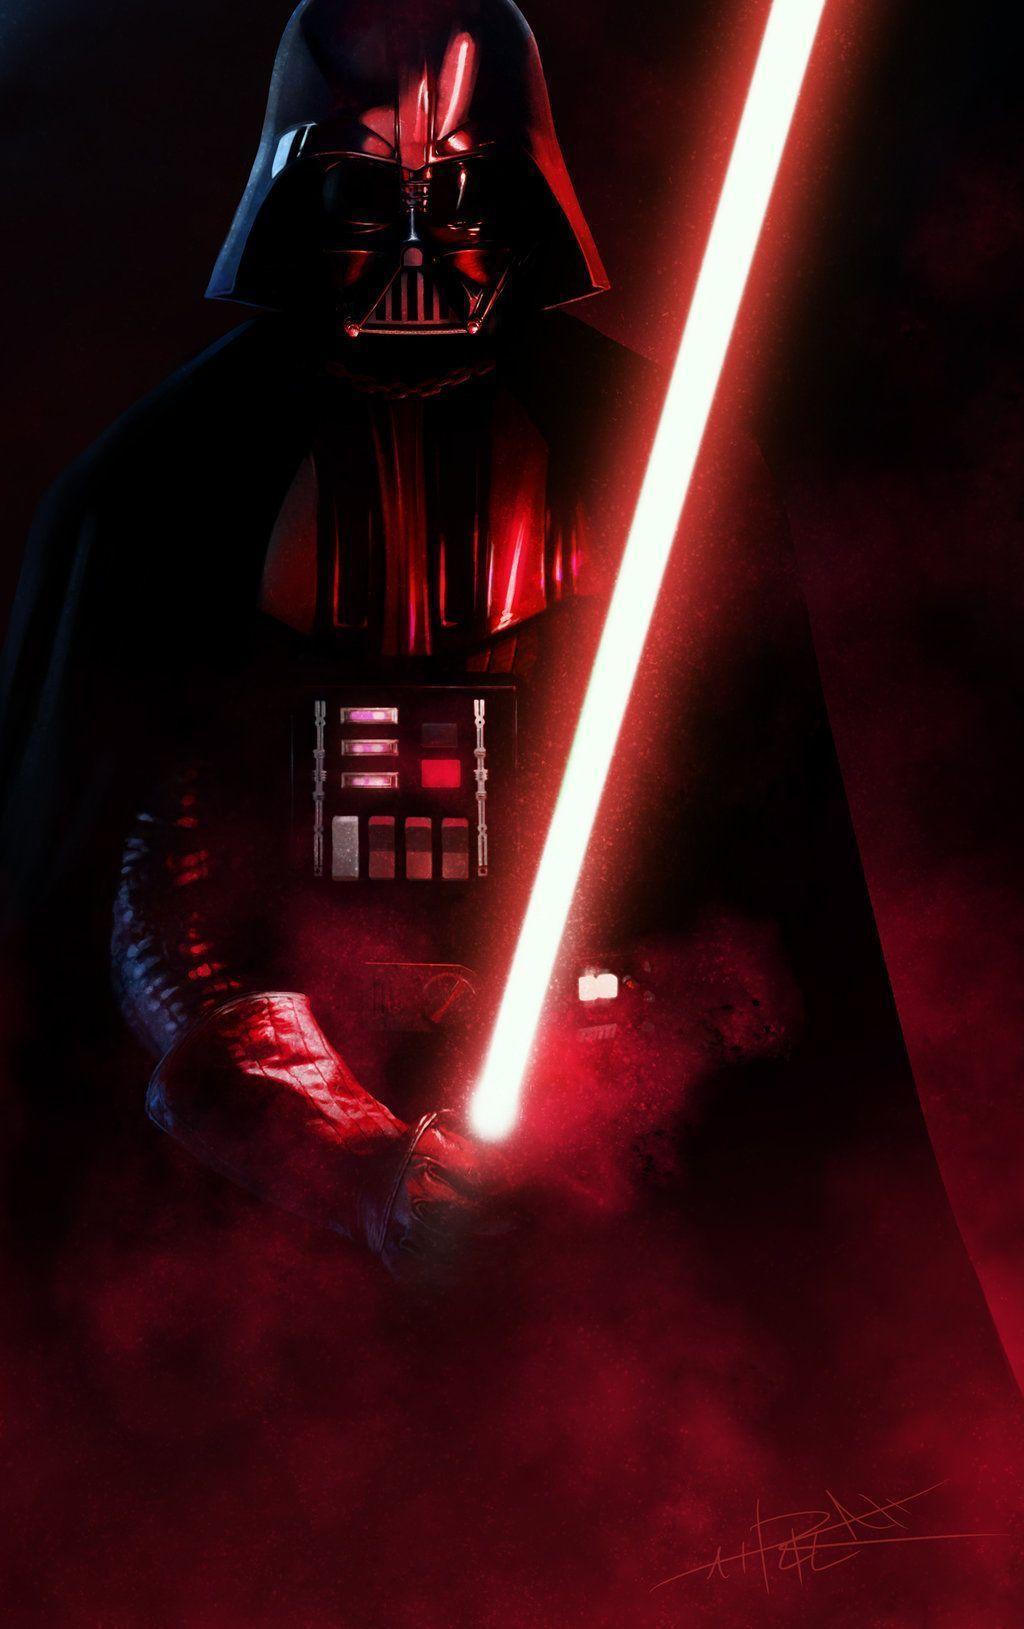 Darth Vader Iphone Wallpapers Top Free Darth Vader Iphone